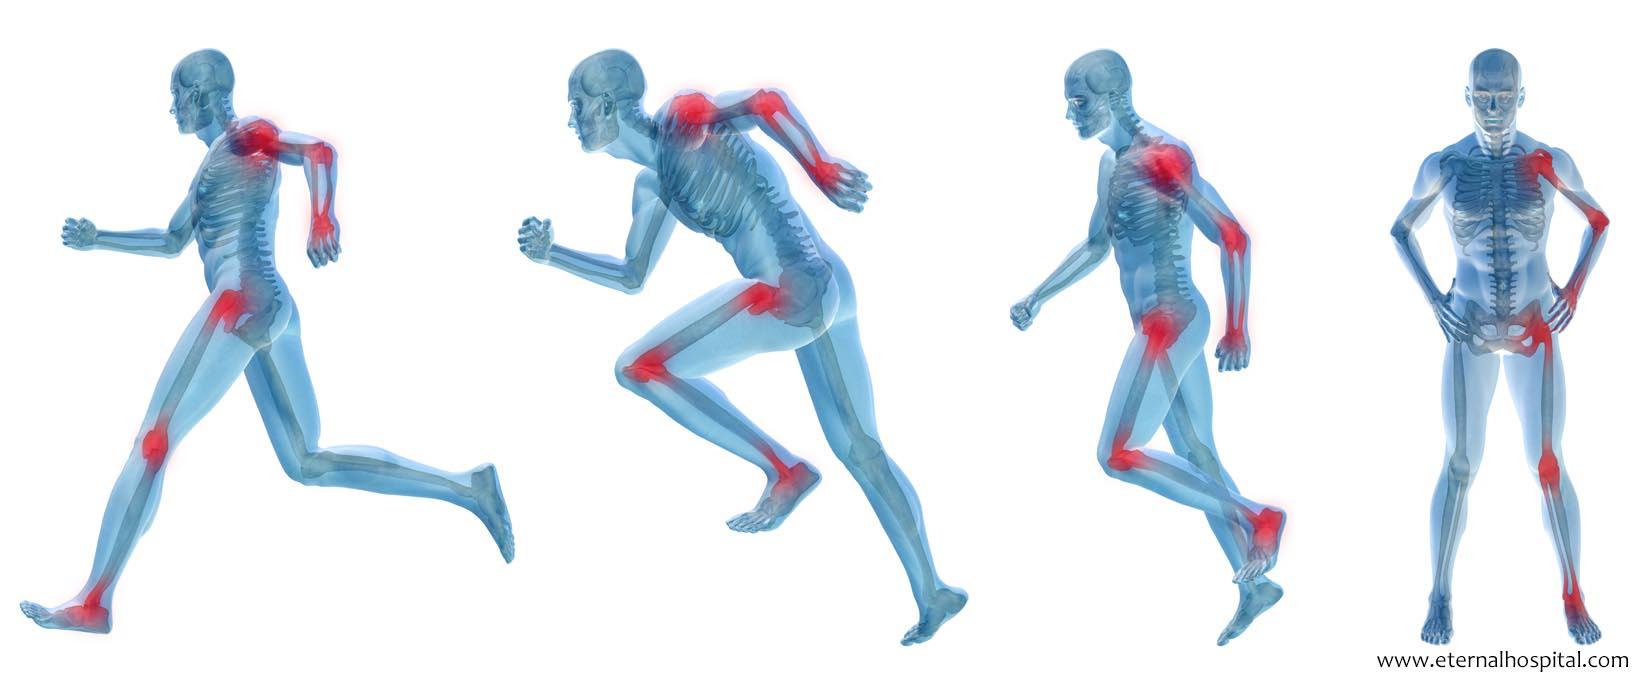 Sports Injury Treatment